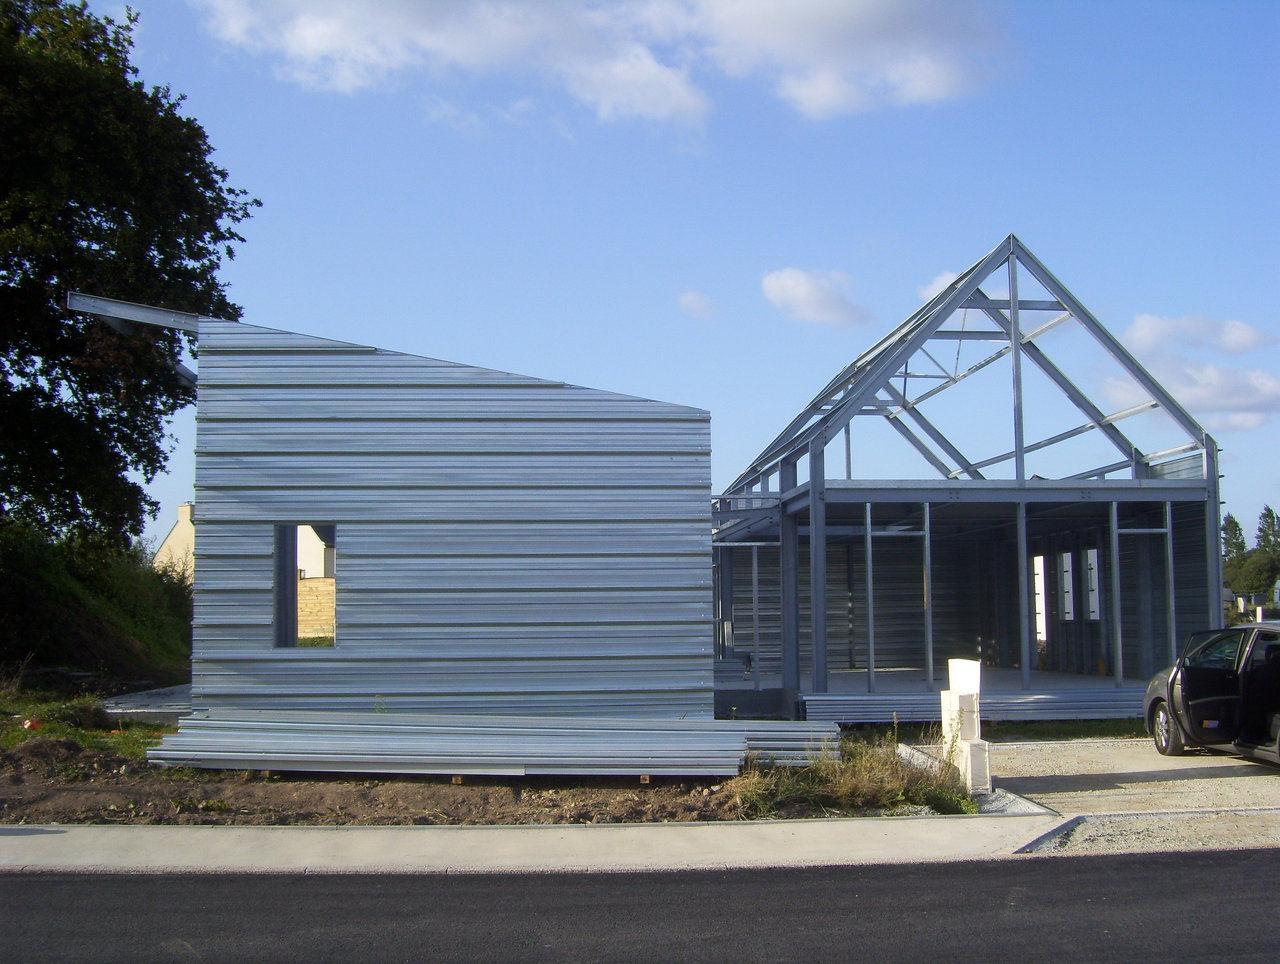 Hometal bureau d etude maison structure metallique - Bureau d etude construction metallique ...